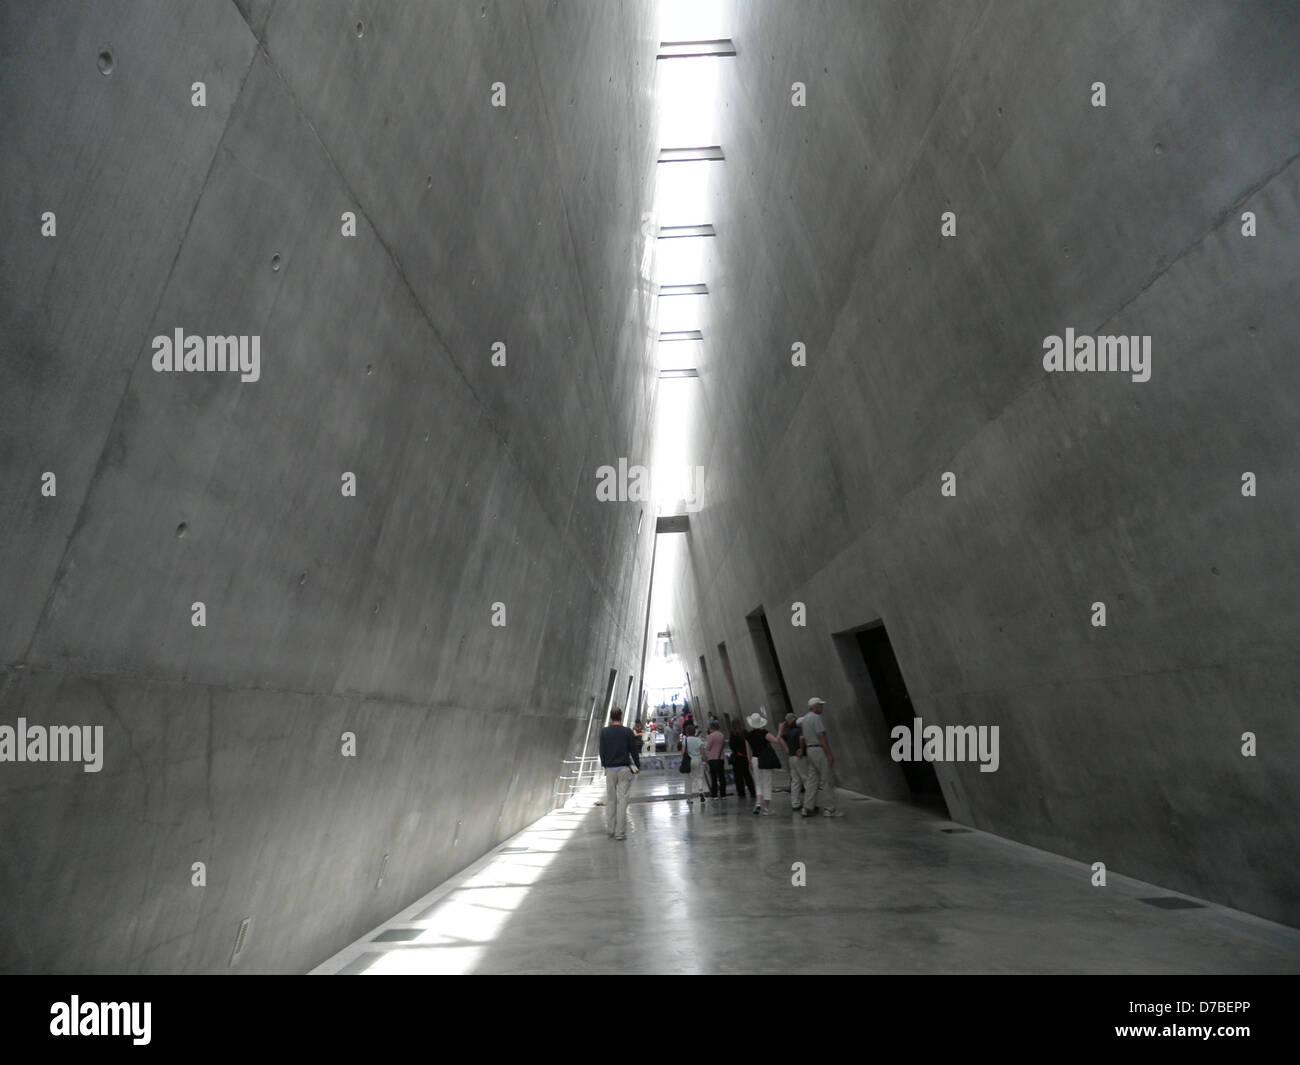 Visiting the Holocaust History Museum at Yad Vashem in Jerusalem - Stock Image